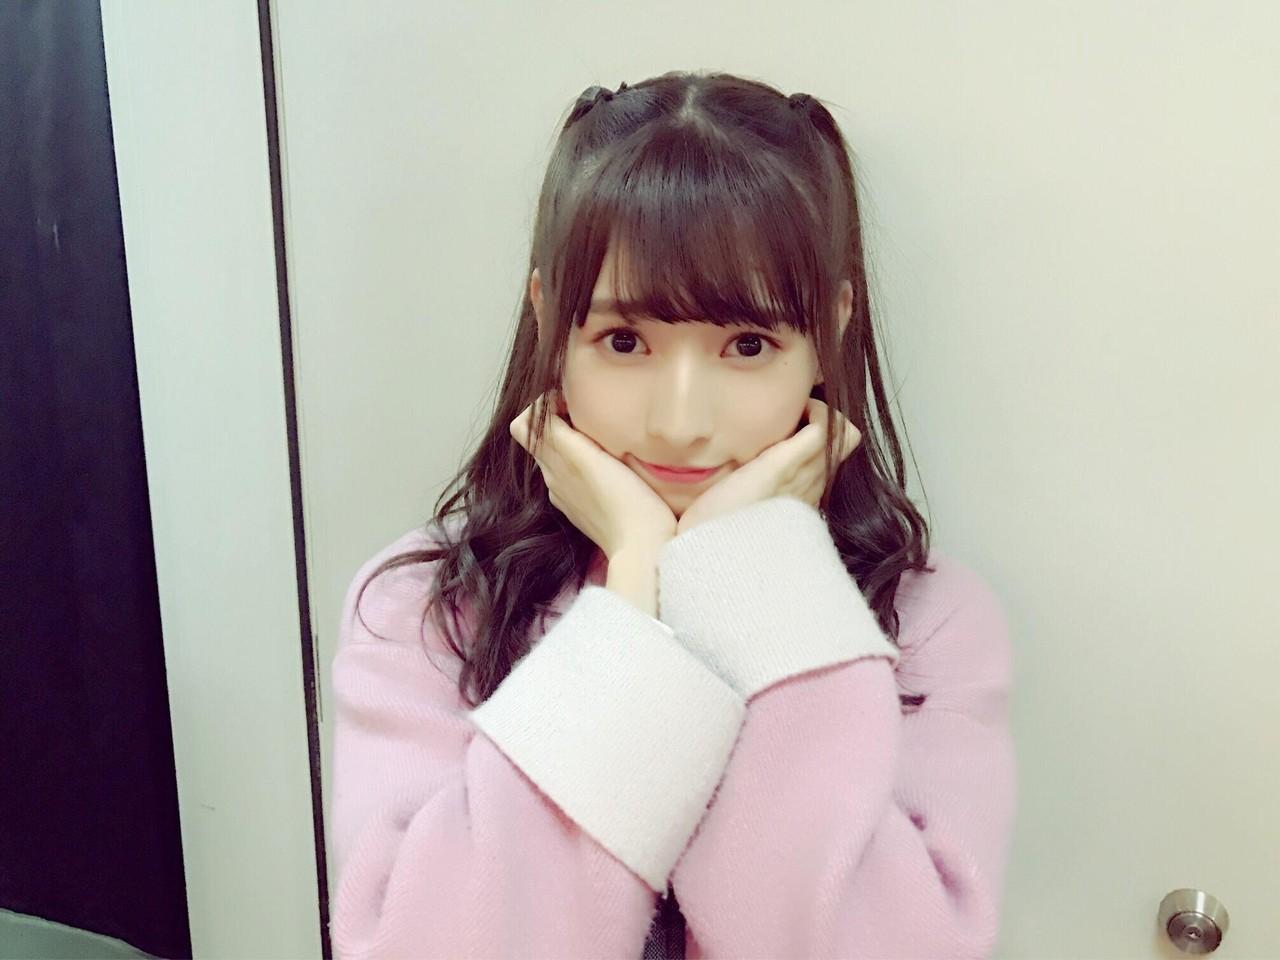 https://livedoor.blogimg.jp/jynjyonjyn-tomiyosi/imgs/6/0/606c0332.jpg